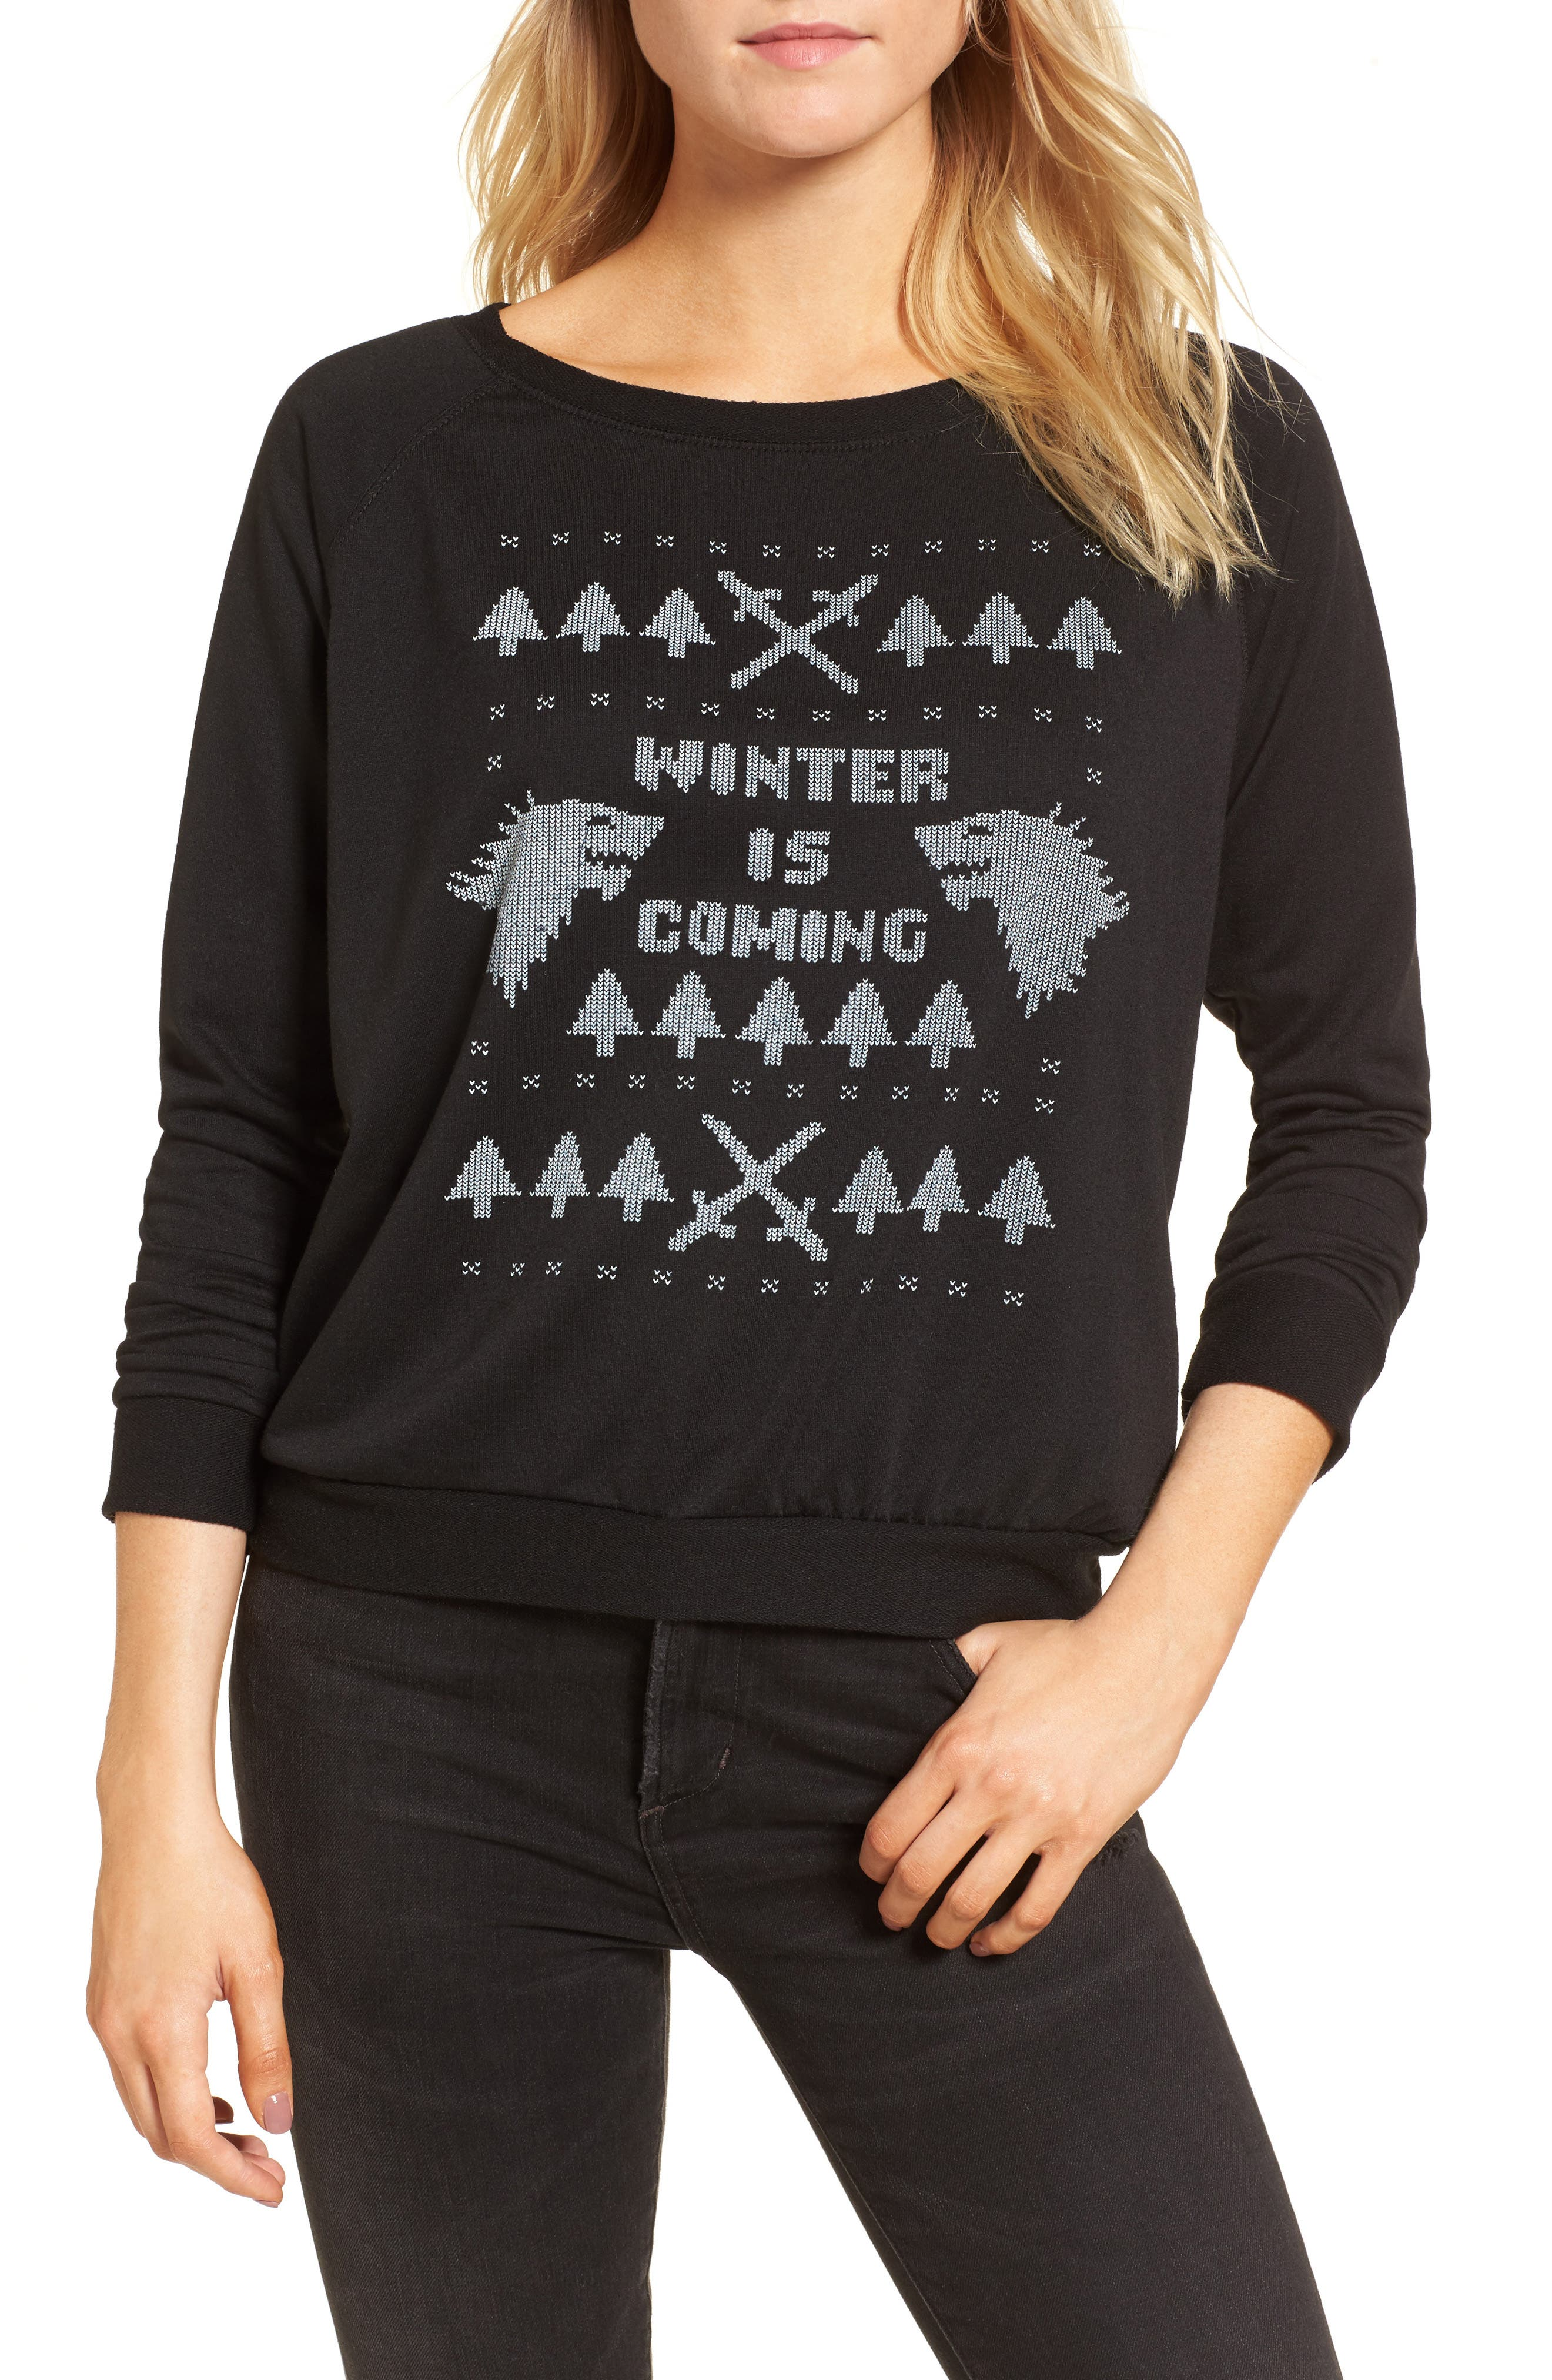 Main Image - Prince Peter Winter Is Coming Sweatshirt